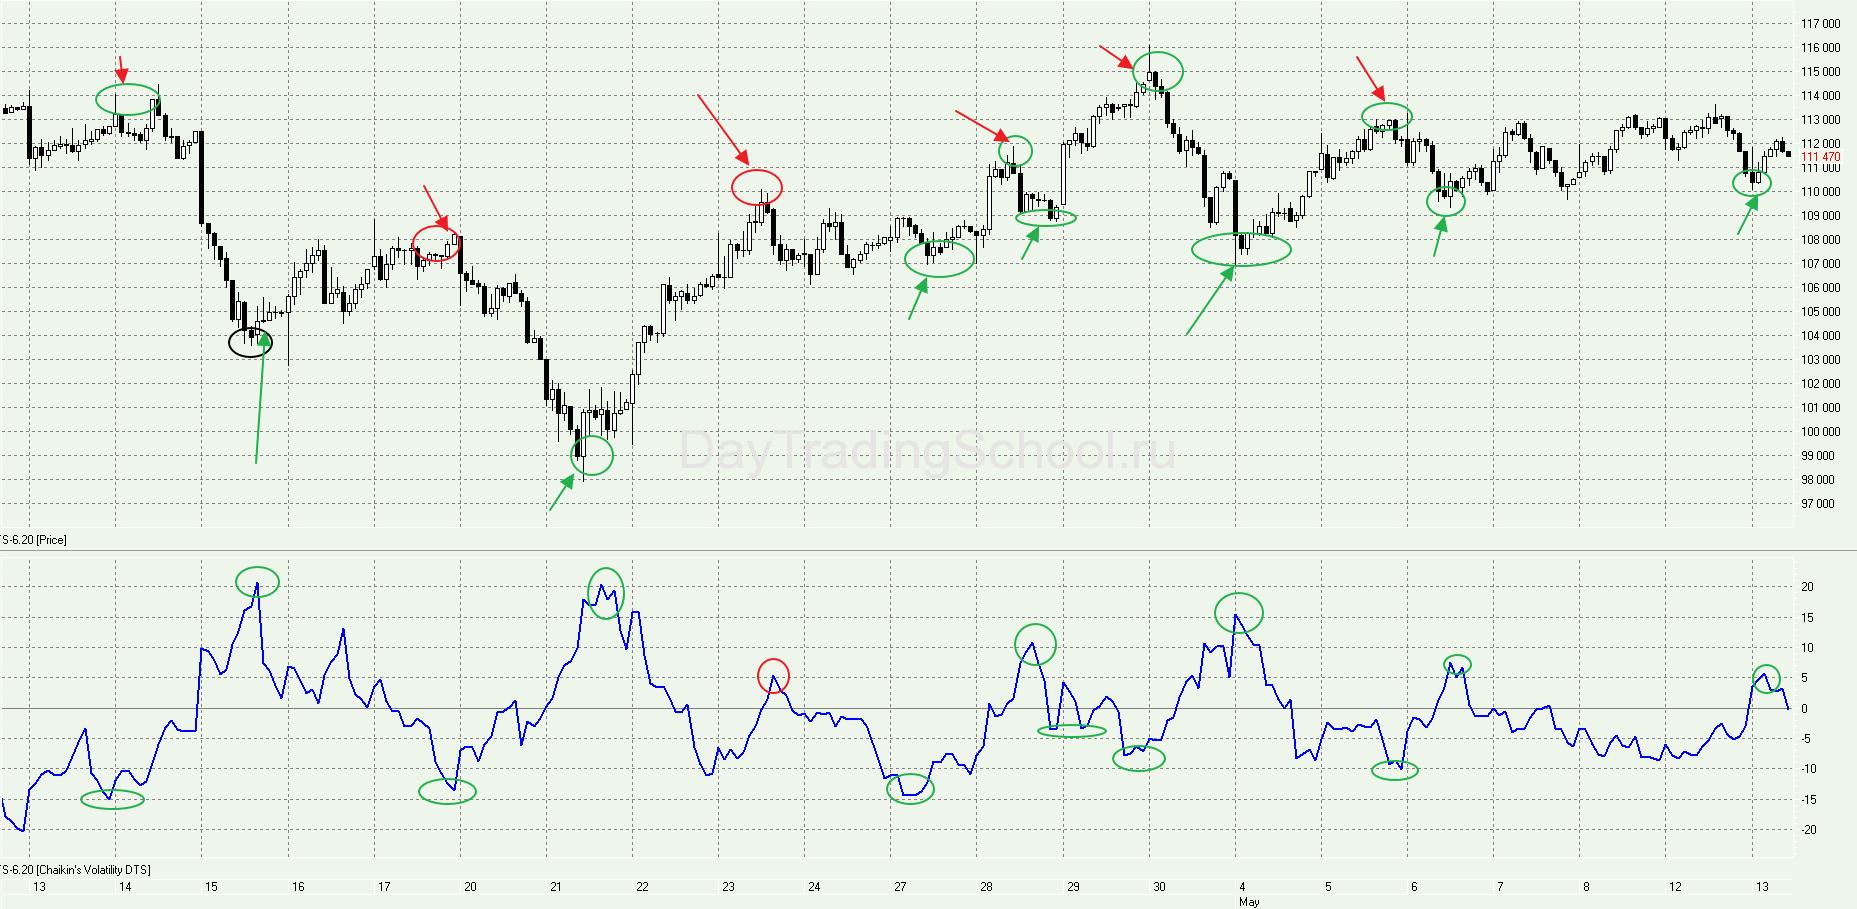 Chaikins-Volatility-сигналы